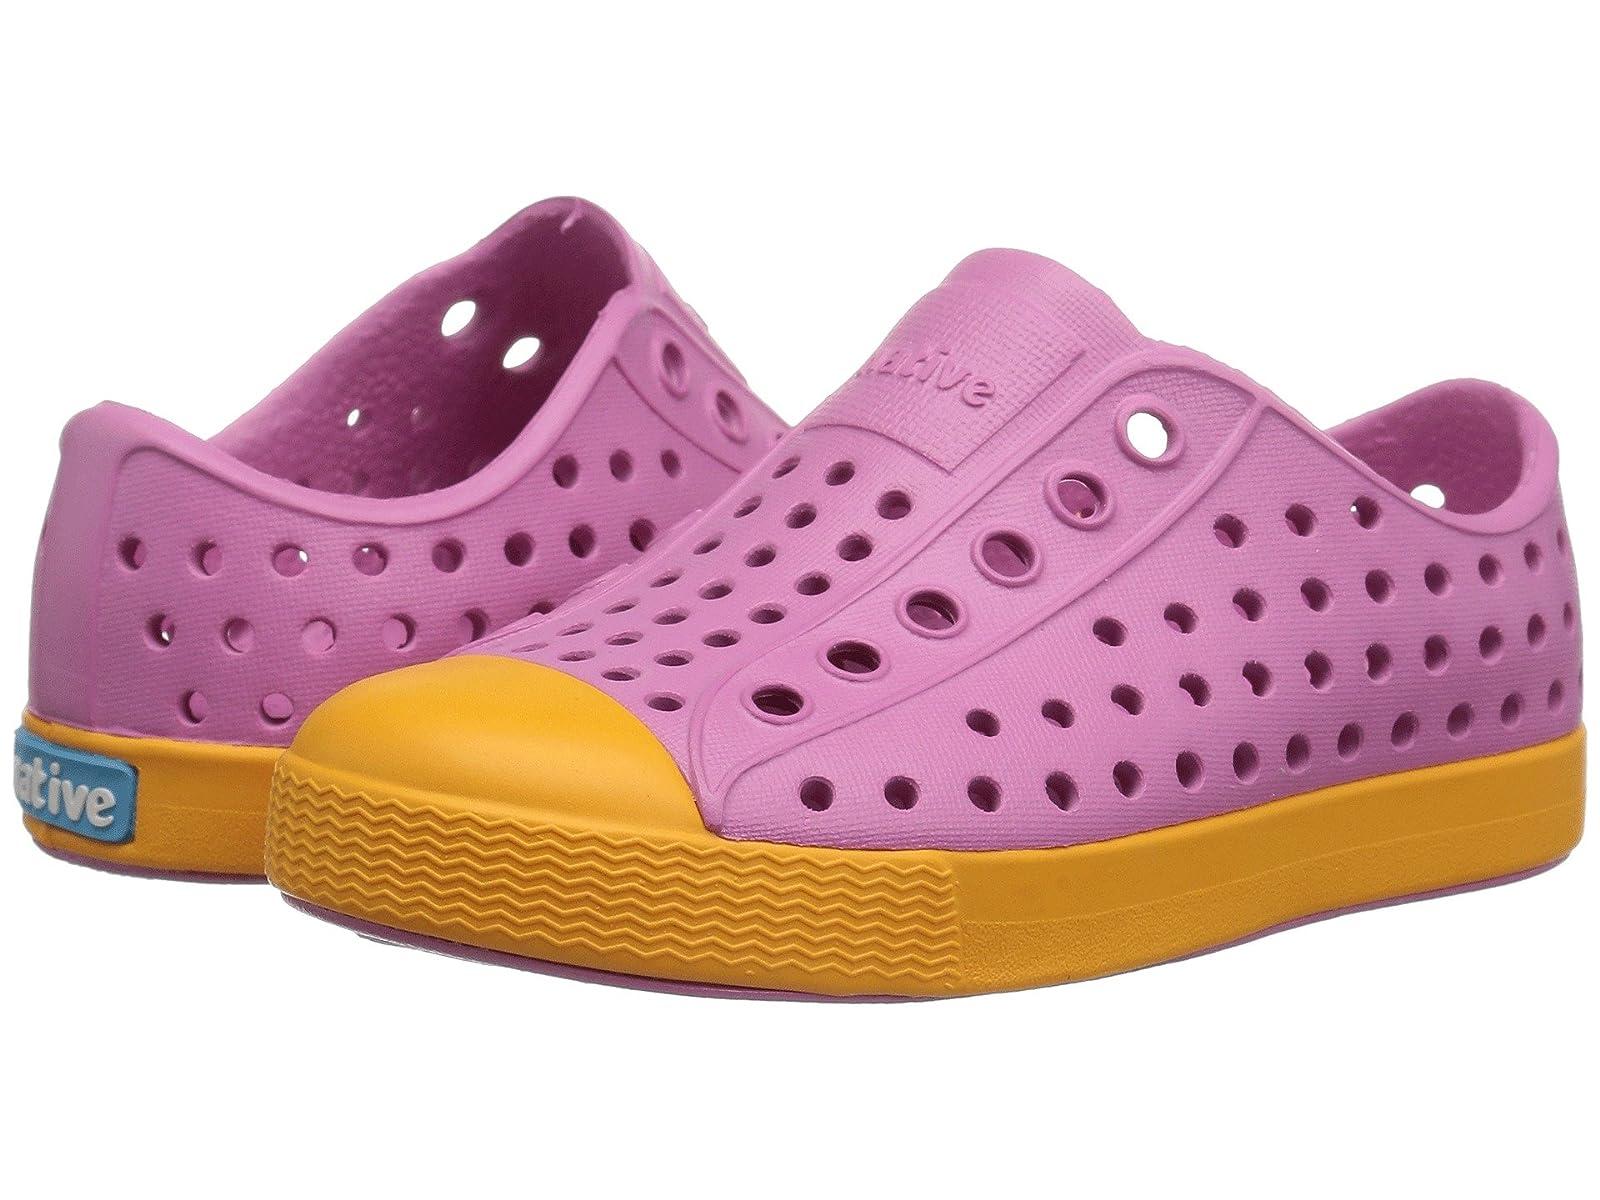 Native Kids Shoes Jefferson (Toddler/Little Kid)Atmospheric grades have affordable shoes